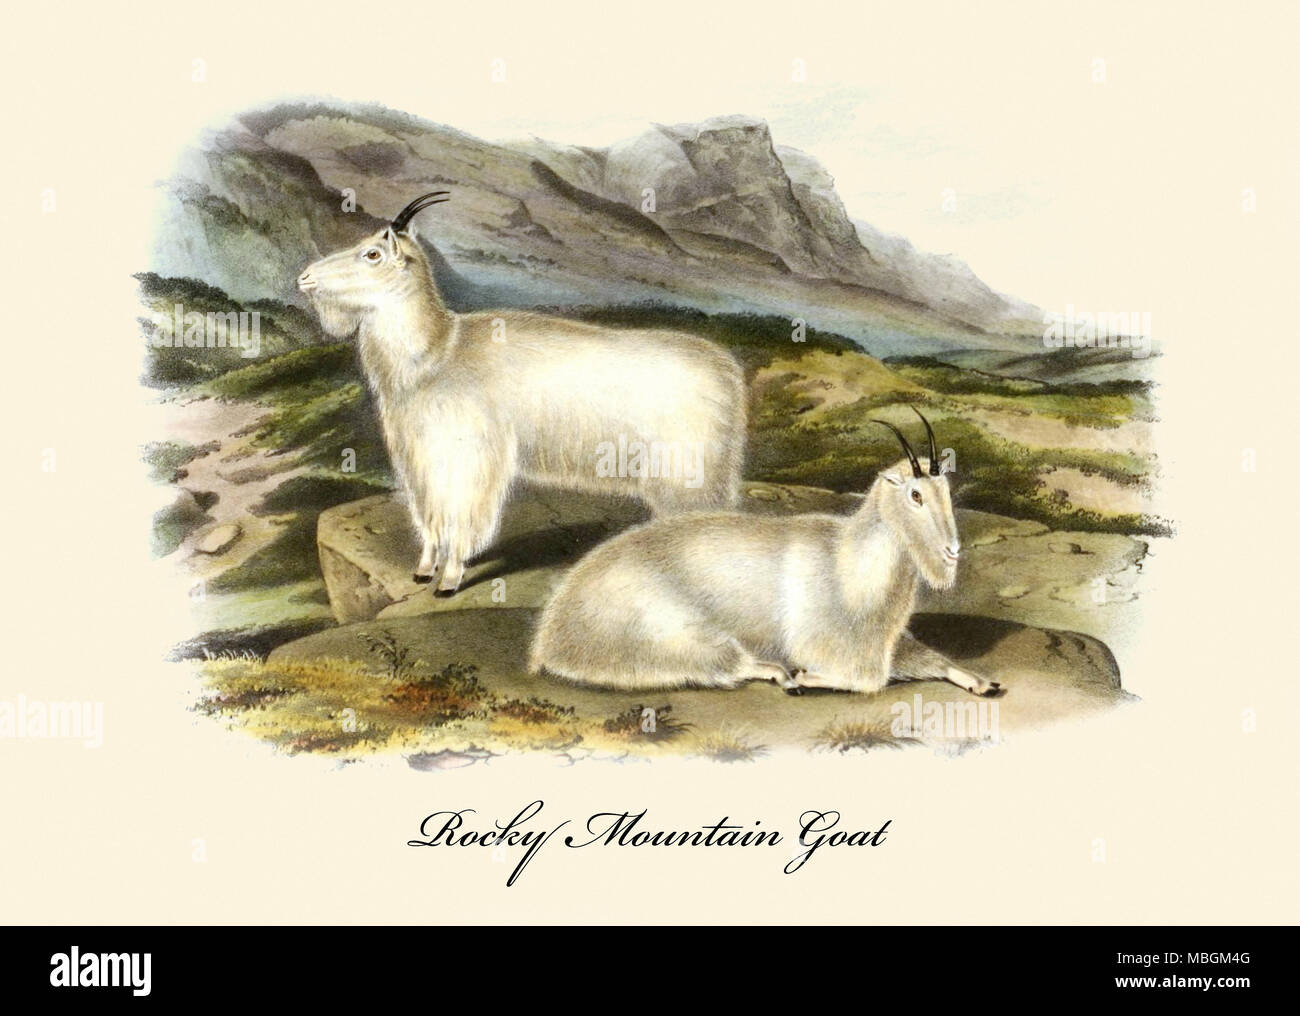 Rocky Mountain Goat - Stock Image